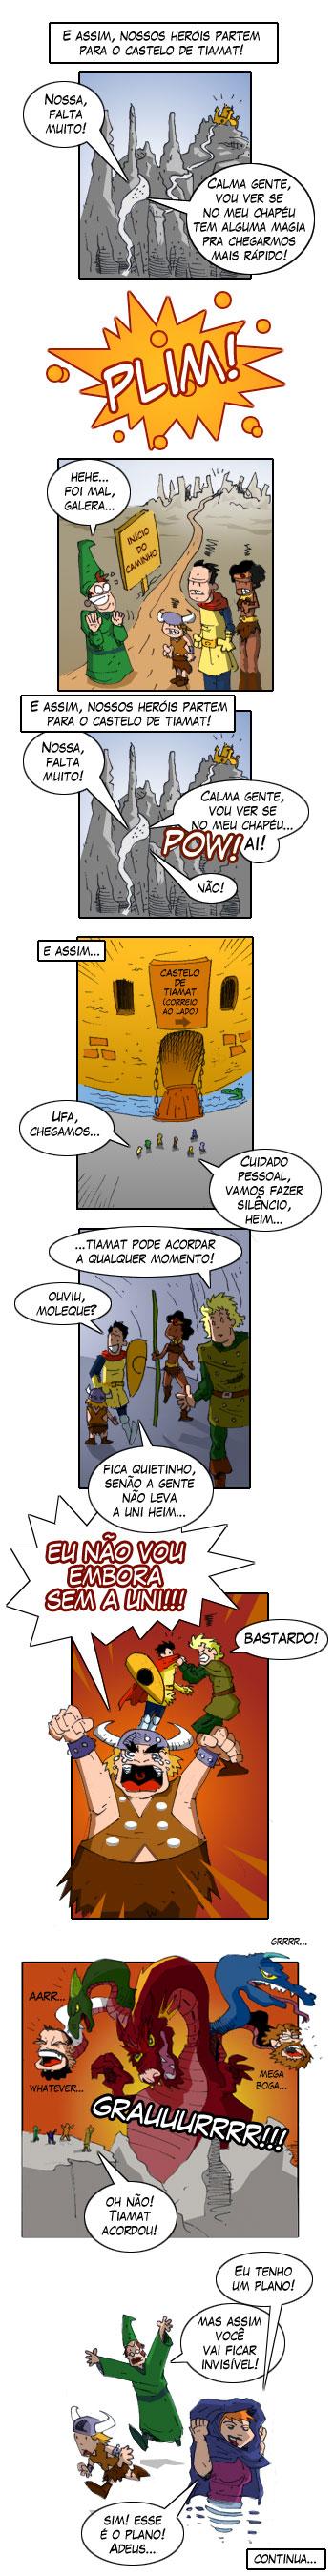 cavernadragao2